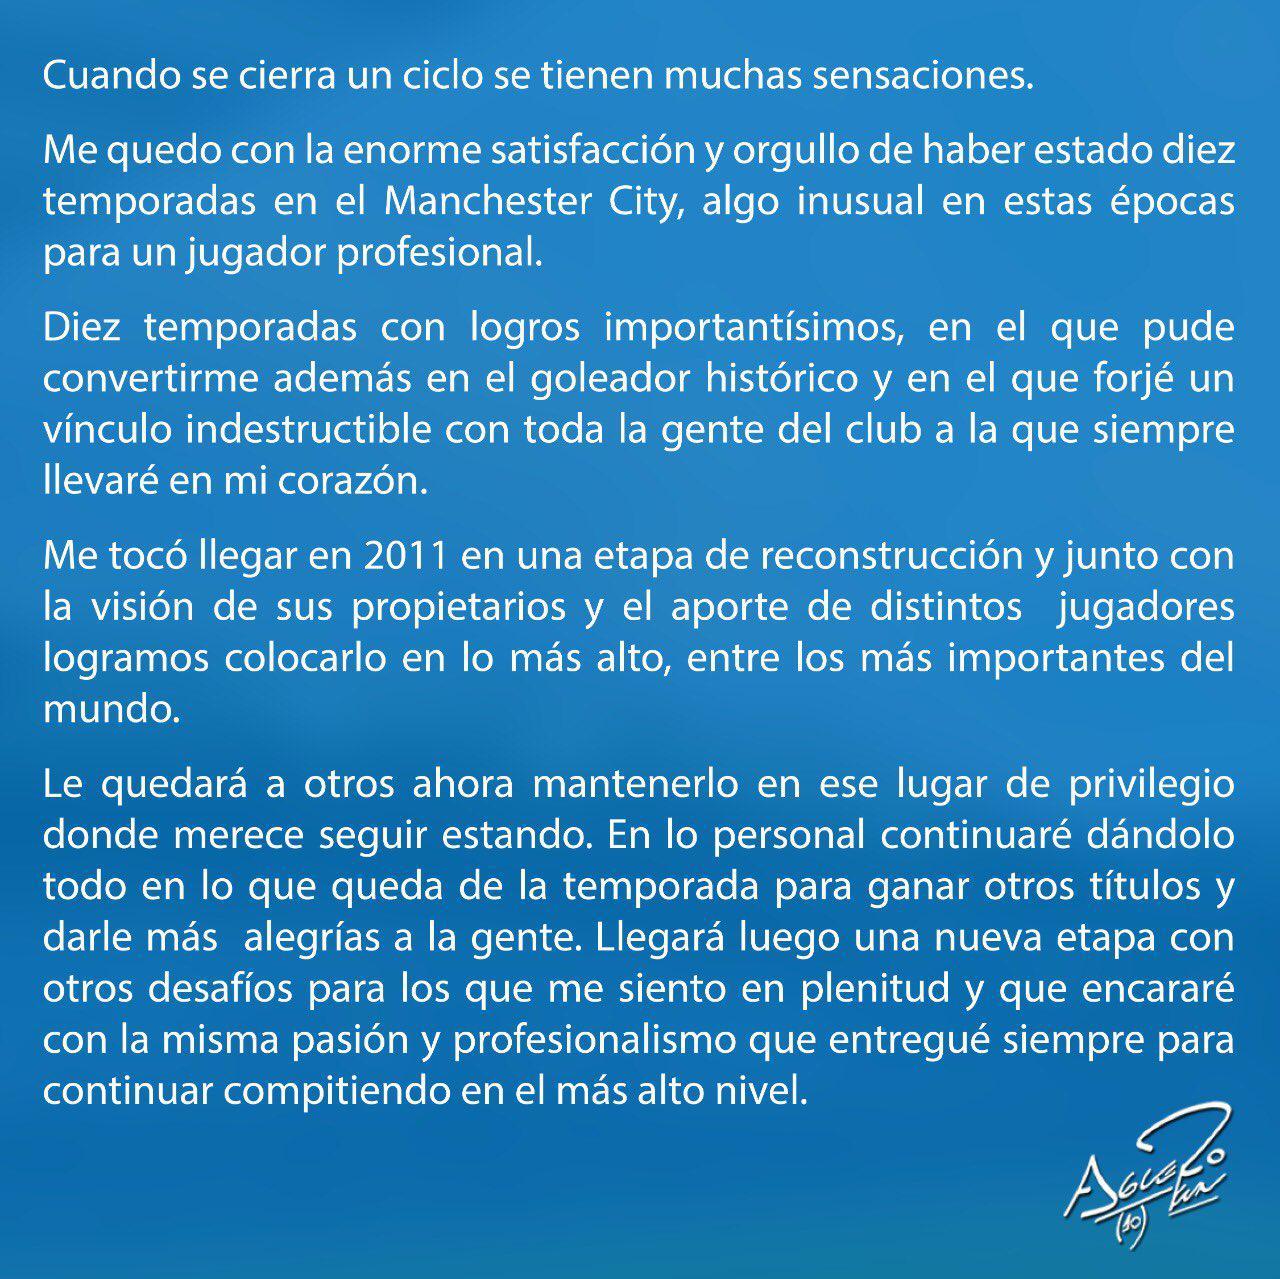 KUN AGUERO DEJA EL MANCHESTER CITY